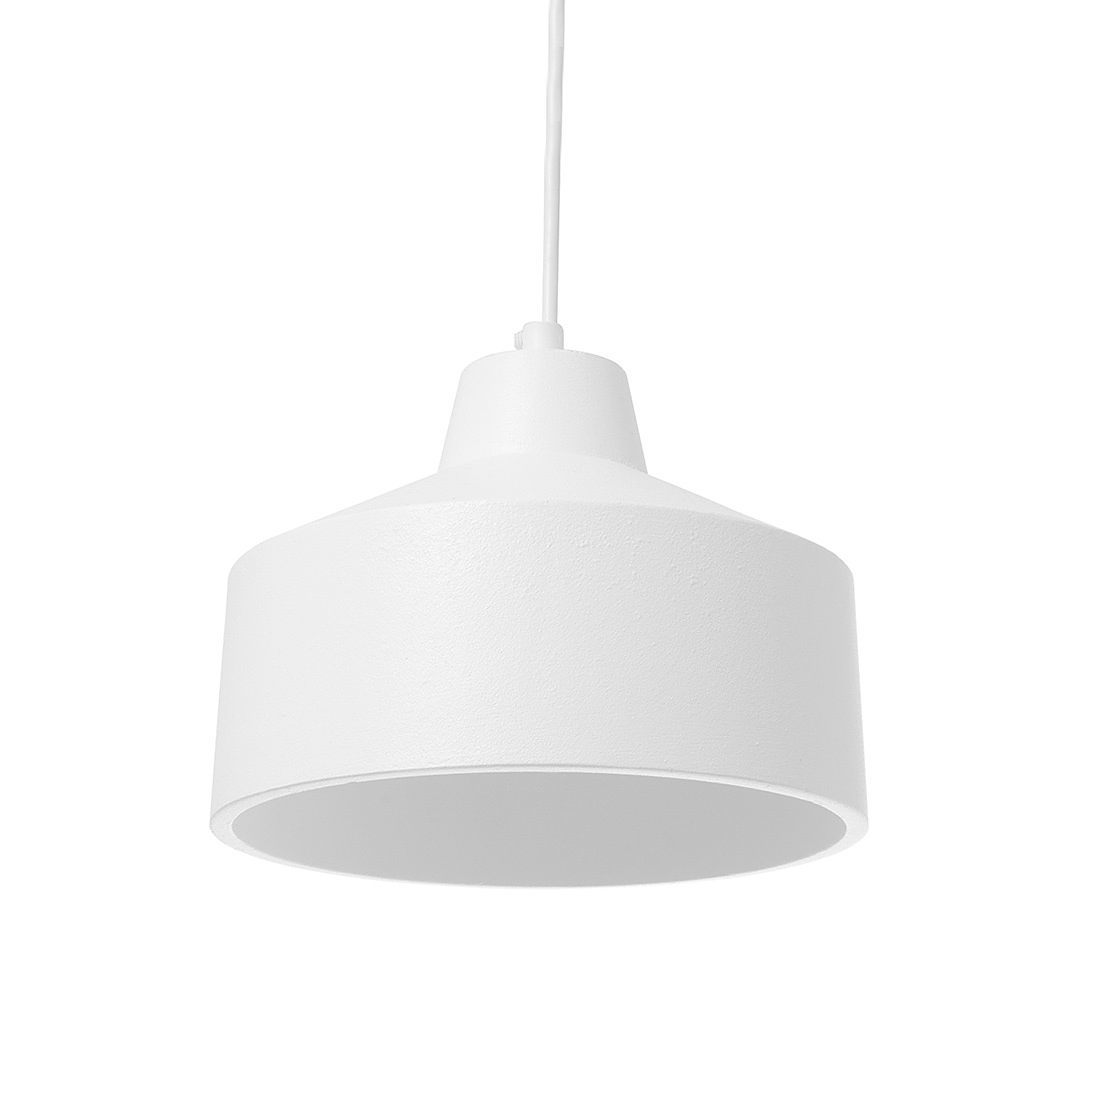 Minimalist White Pendant Lamp By Jonathan Sabine